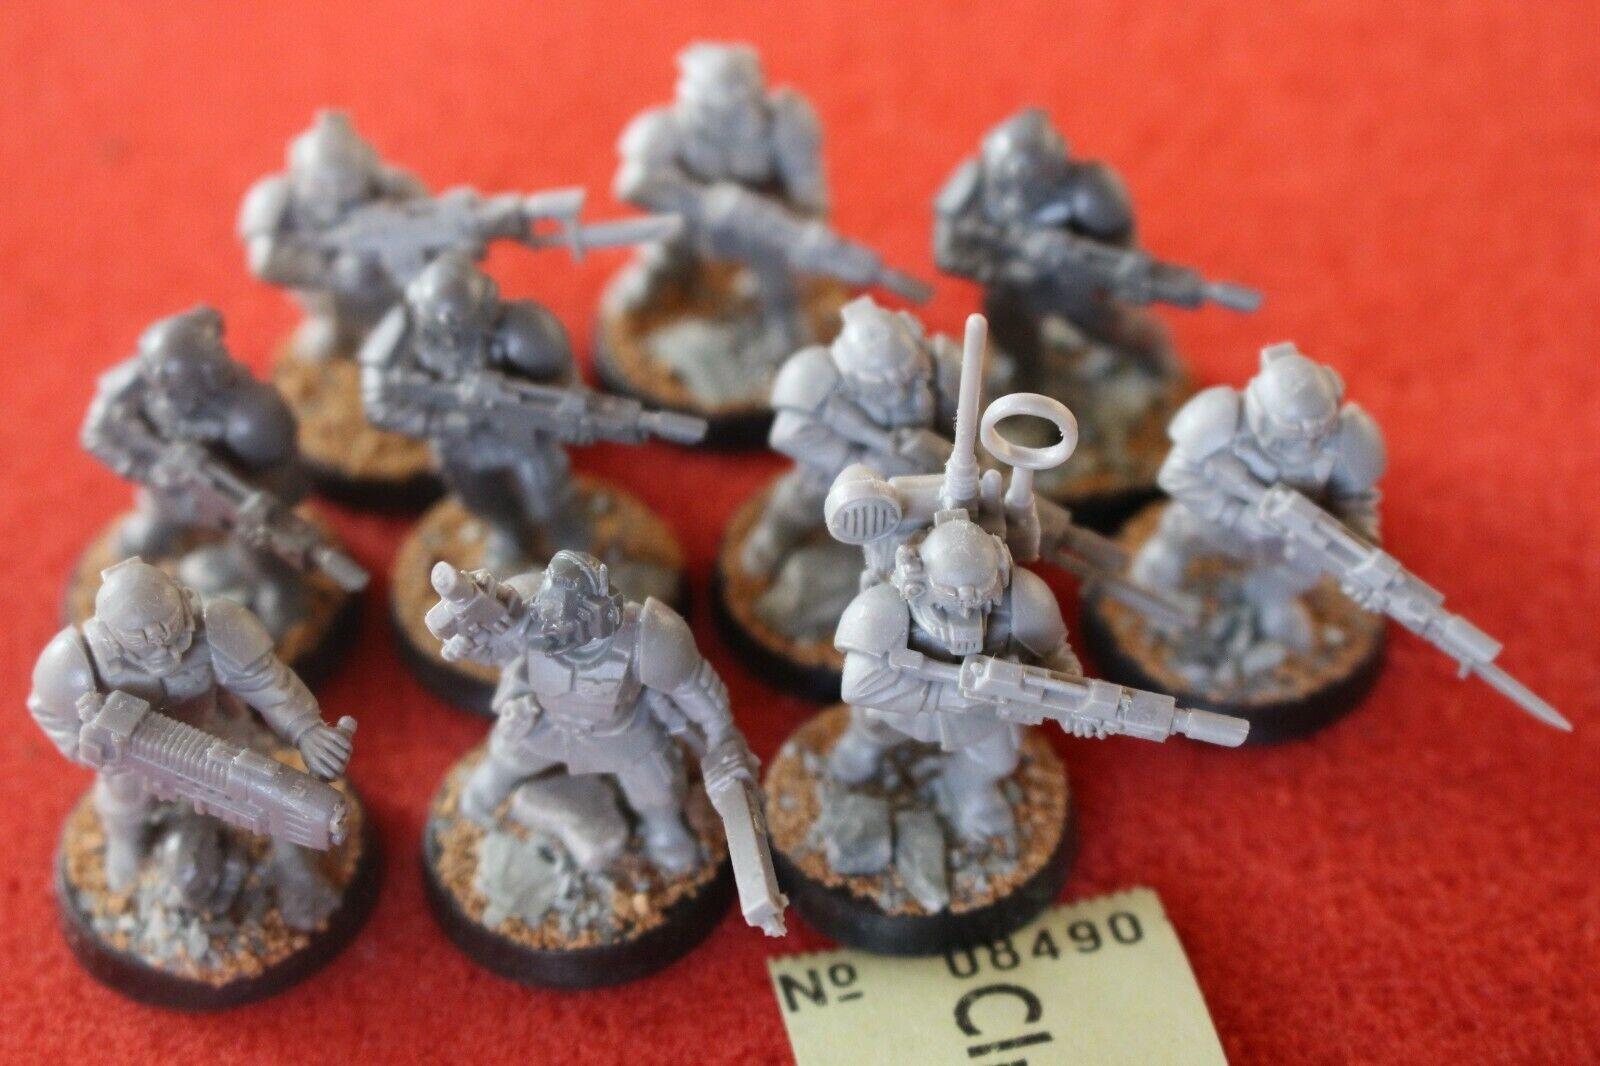 Games Workshop Warhammer 40k Astra Militarum Cadians Cadian Squad Based Army E6